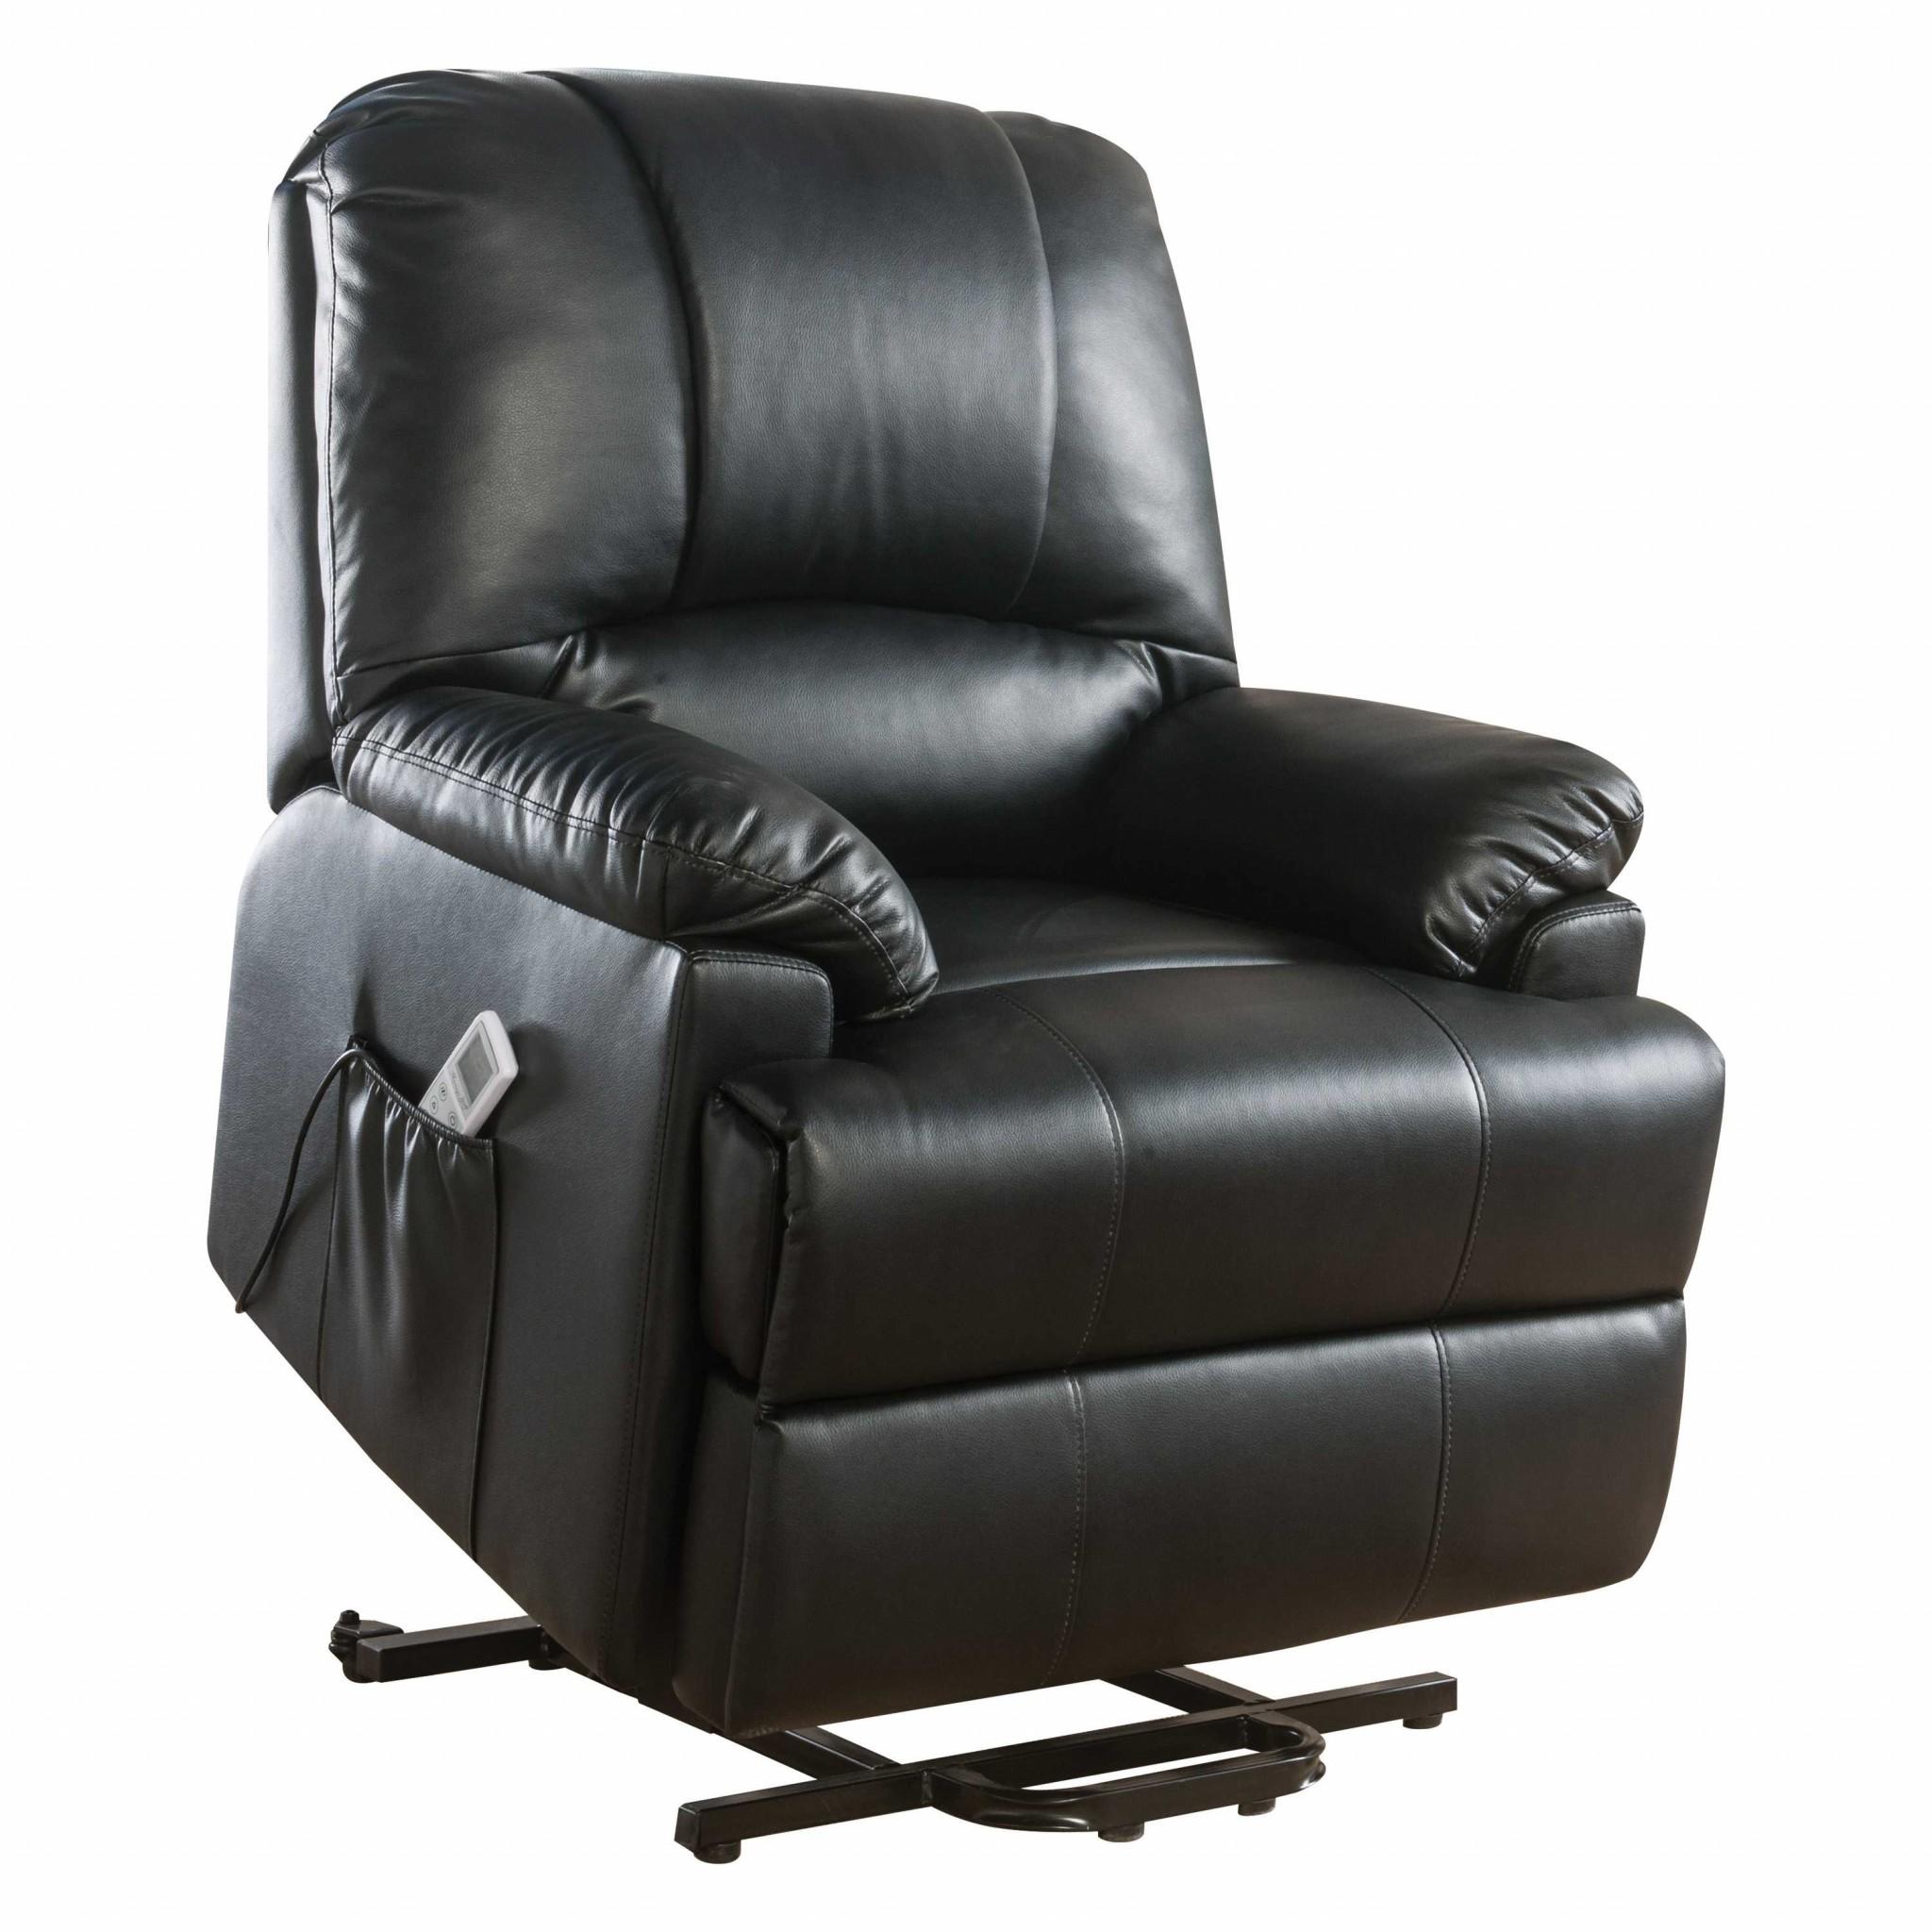 "34"" X 37"" X 41"" Black Leatherette Power Lift Massage Recliner"